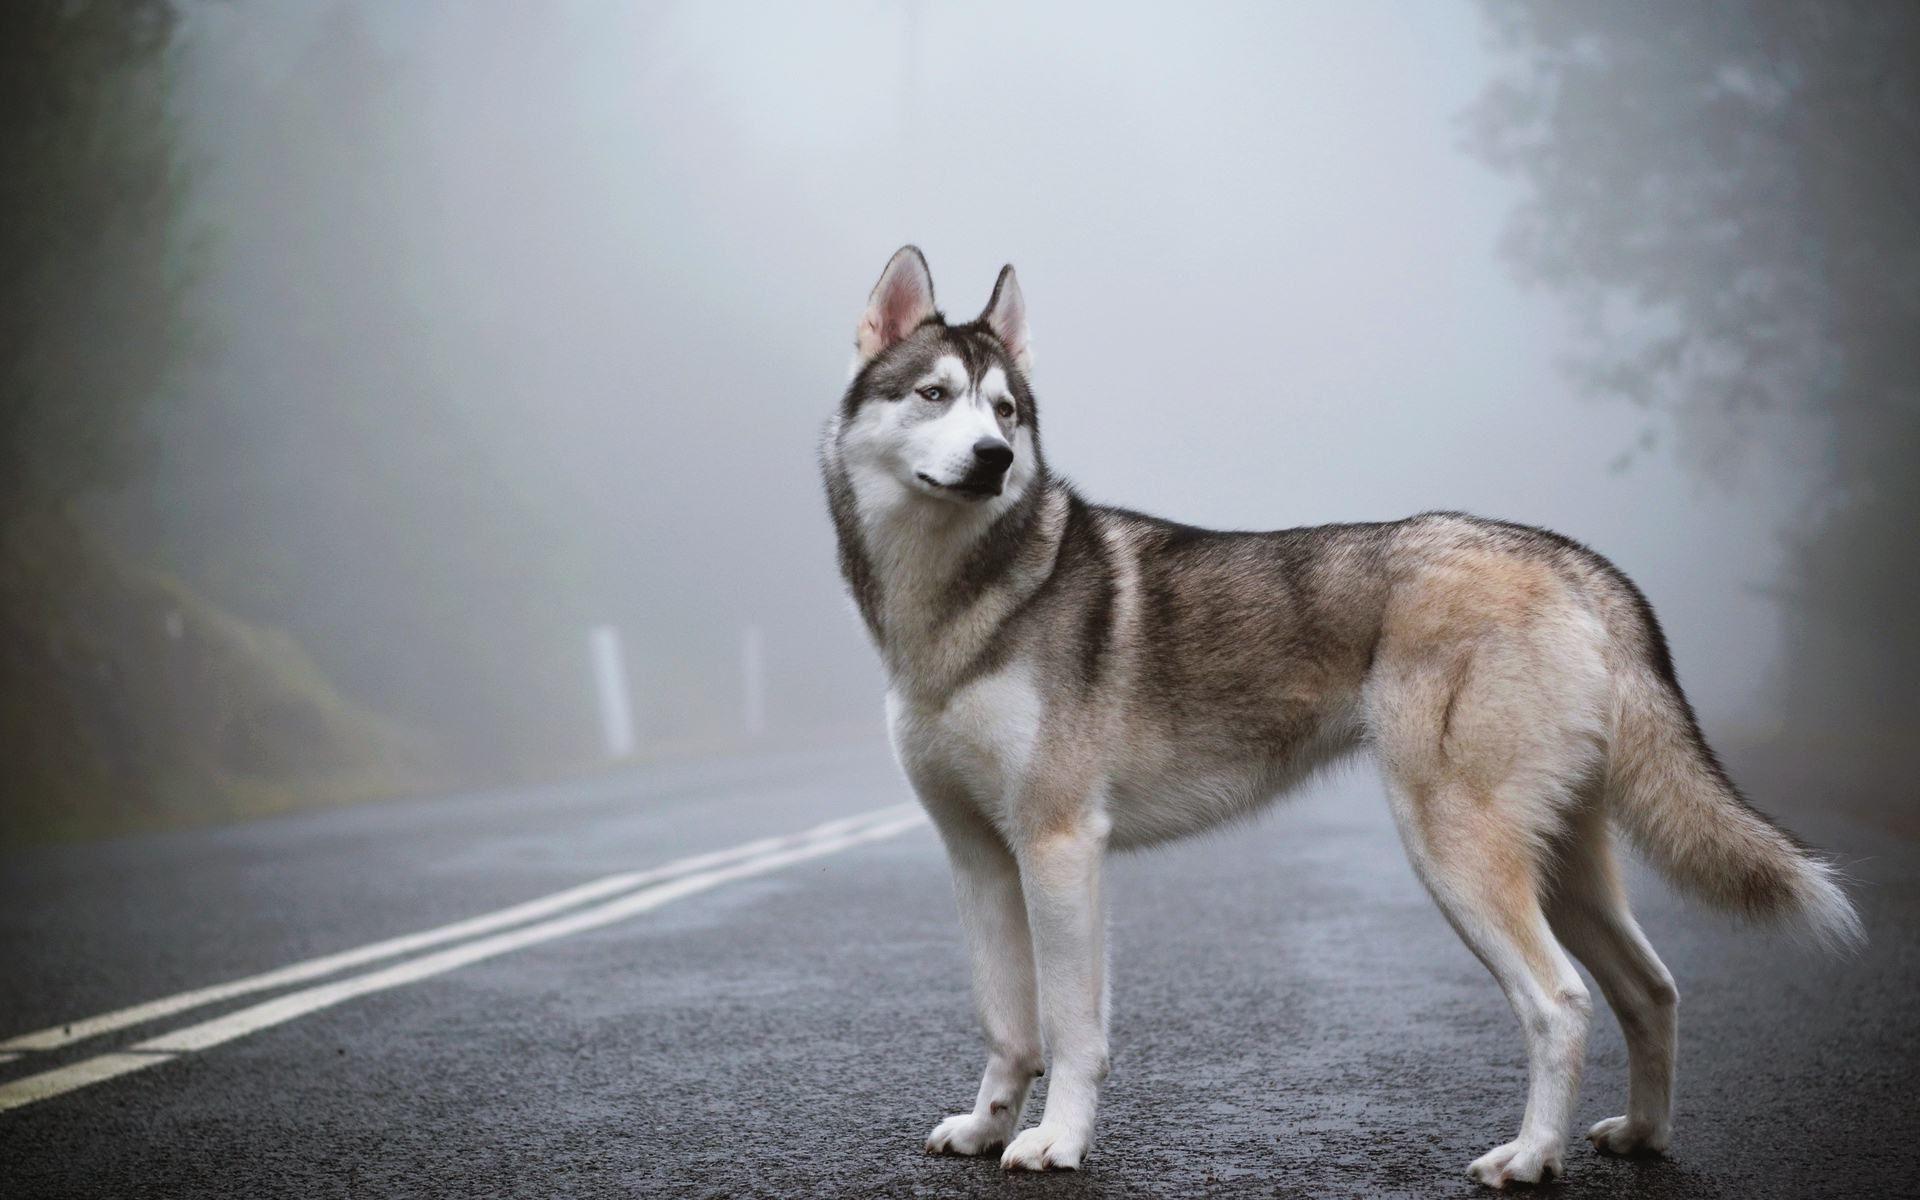 Wild Animals Wallpaper Hd Siberian Husky Husky Dogs Dogs